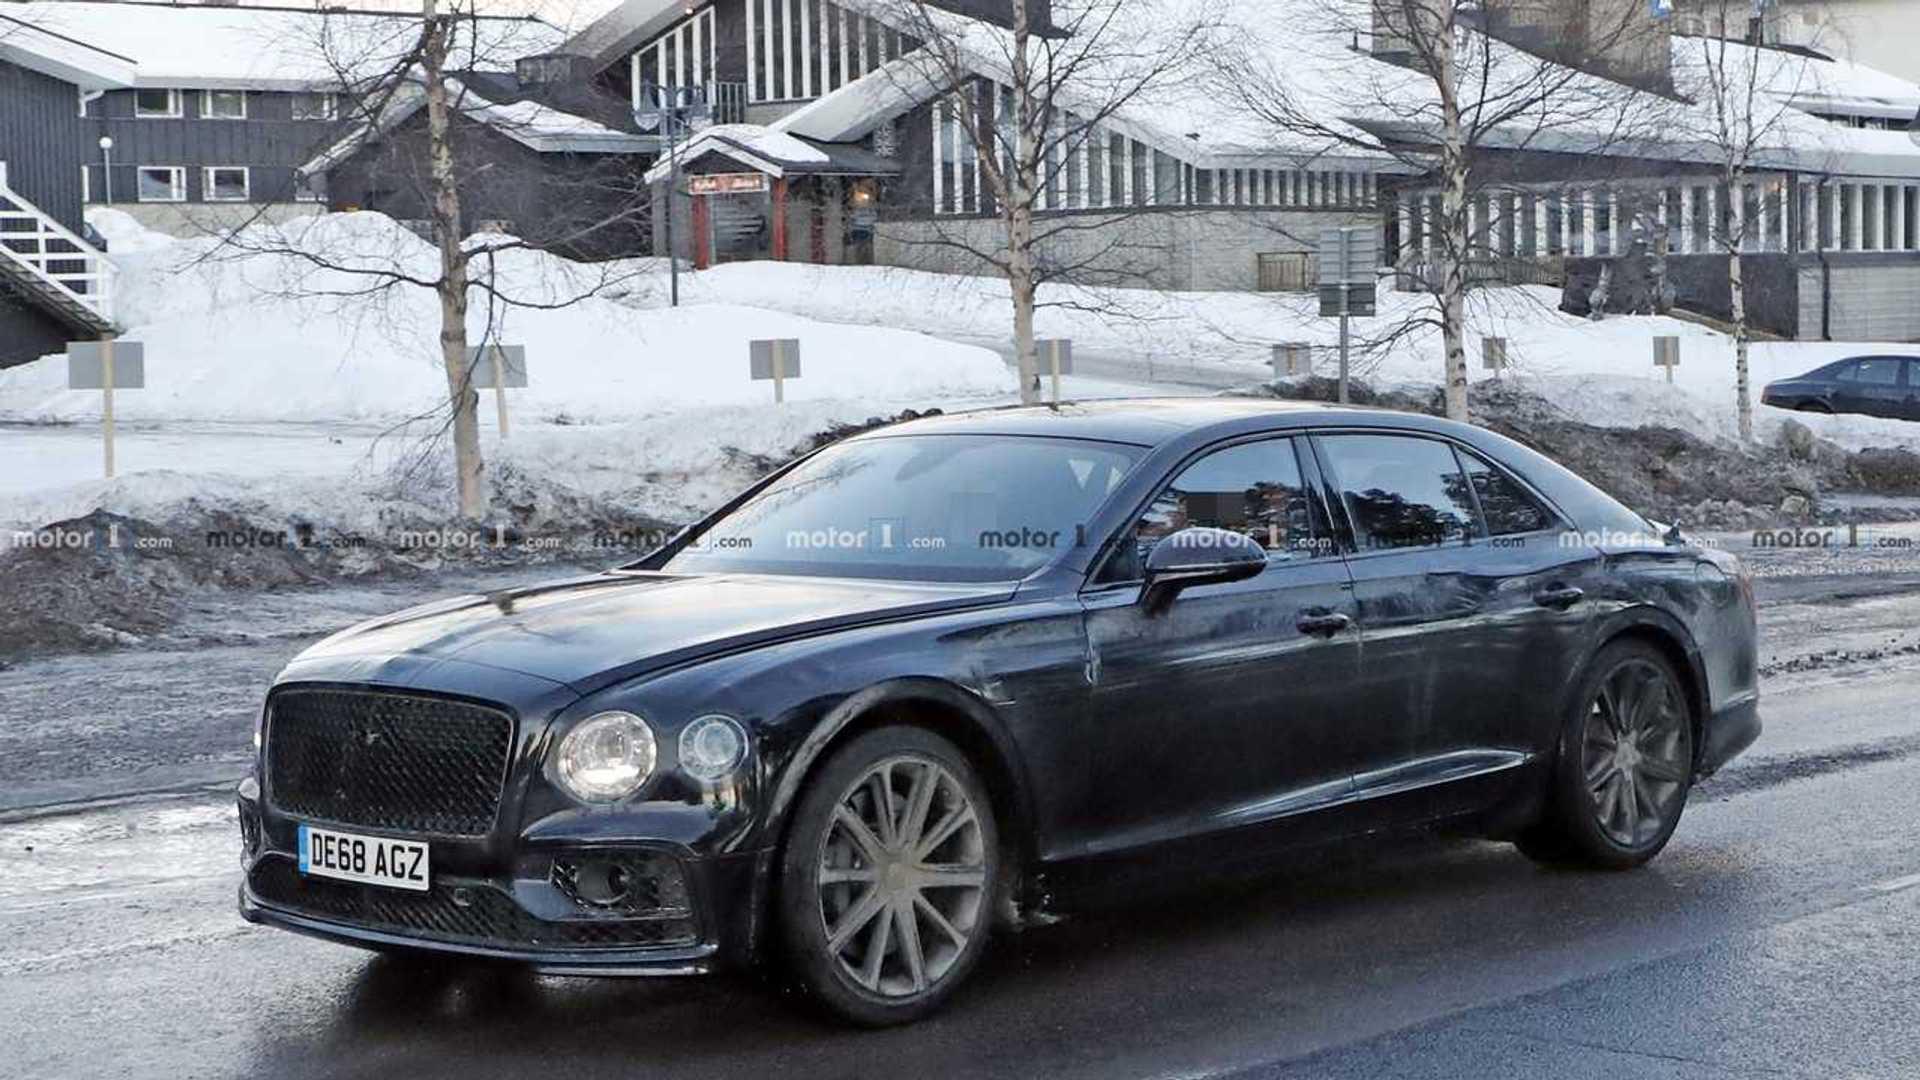 2019 - [Bentley] Flying Spur - Page 2 Bentley-flying-spur-phev-spy-photo